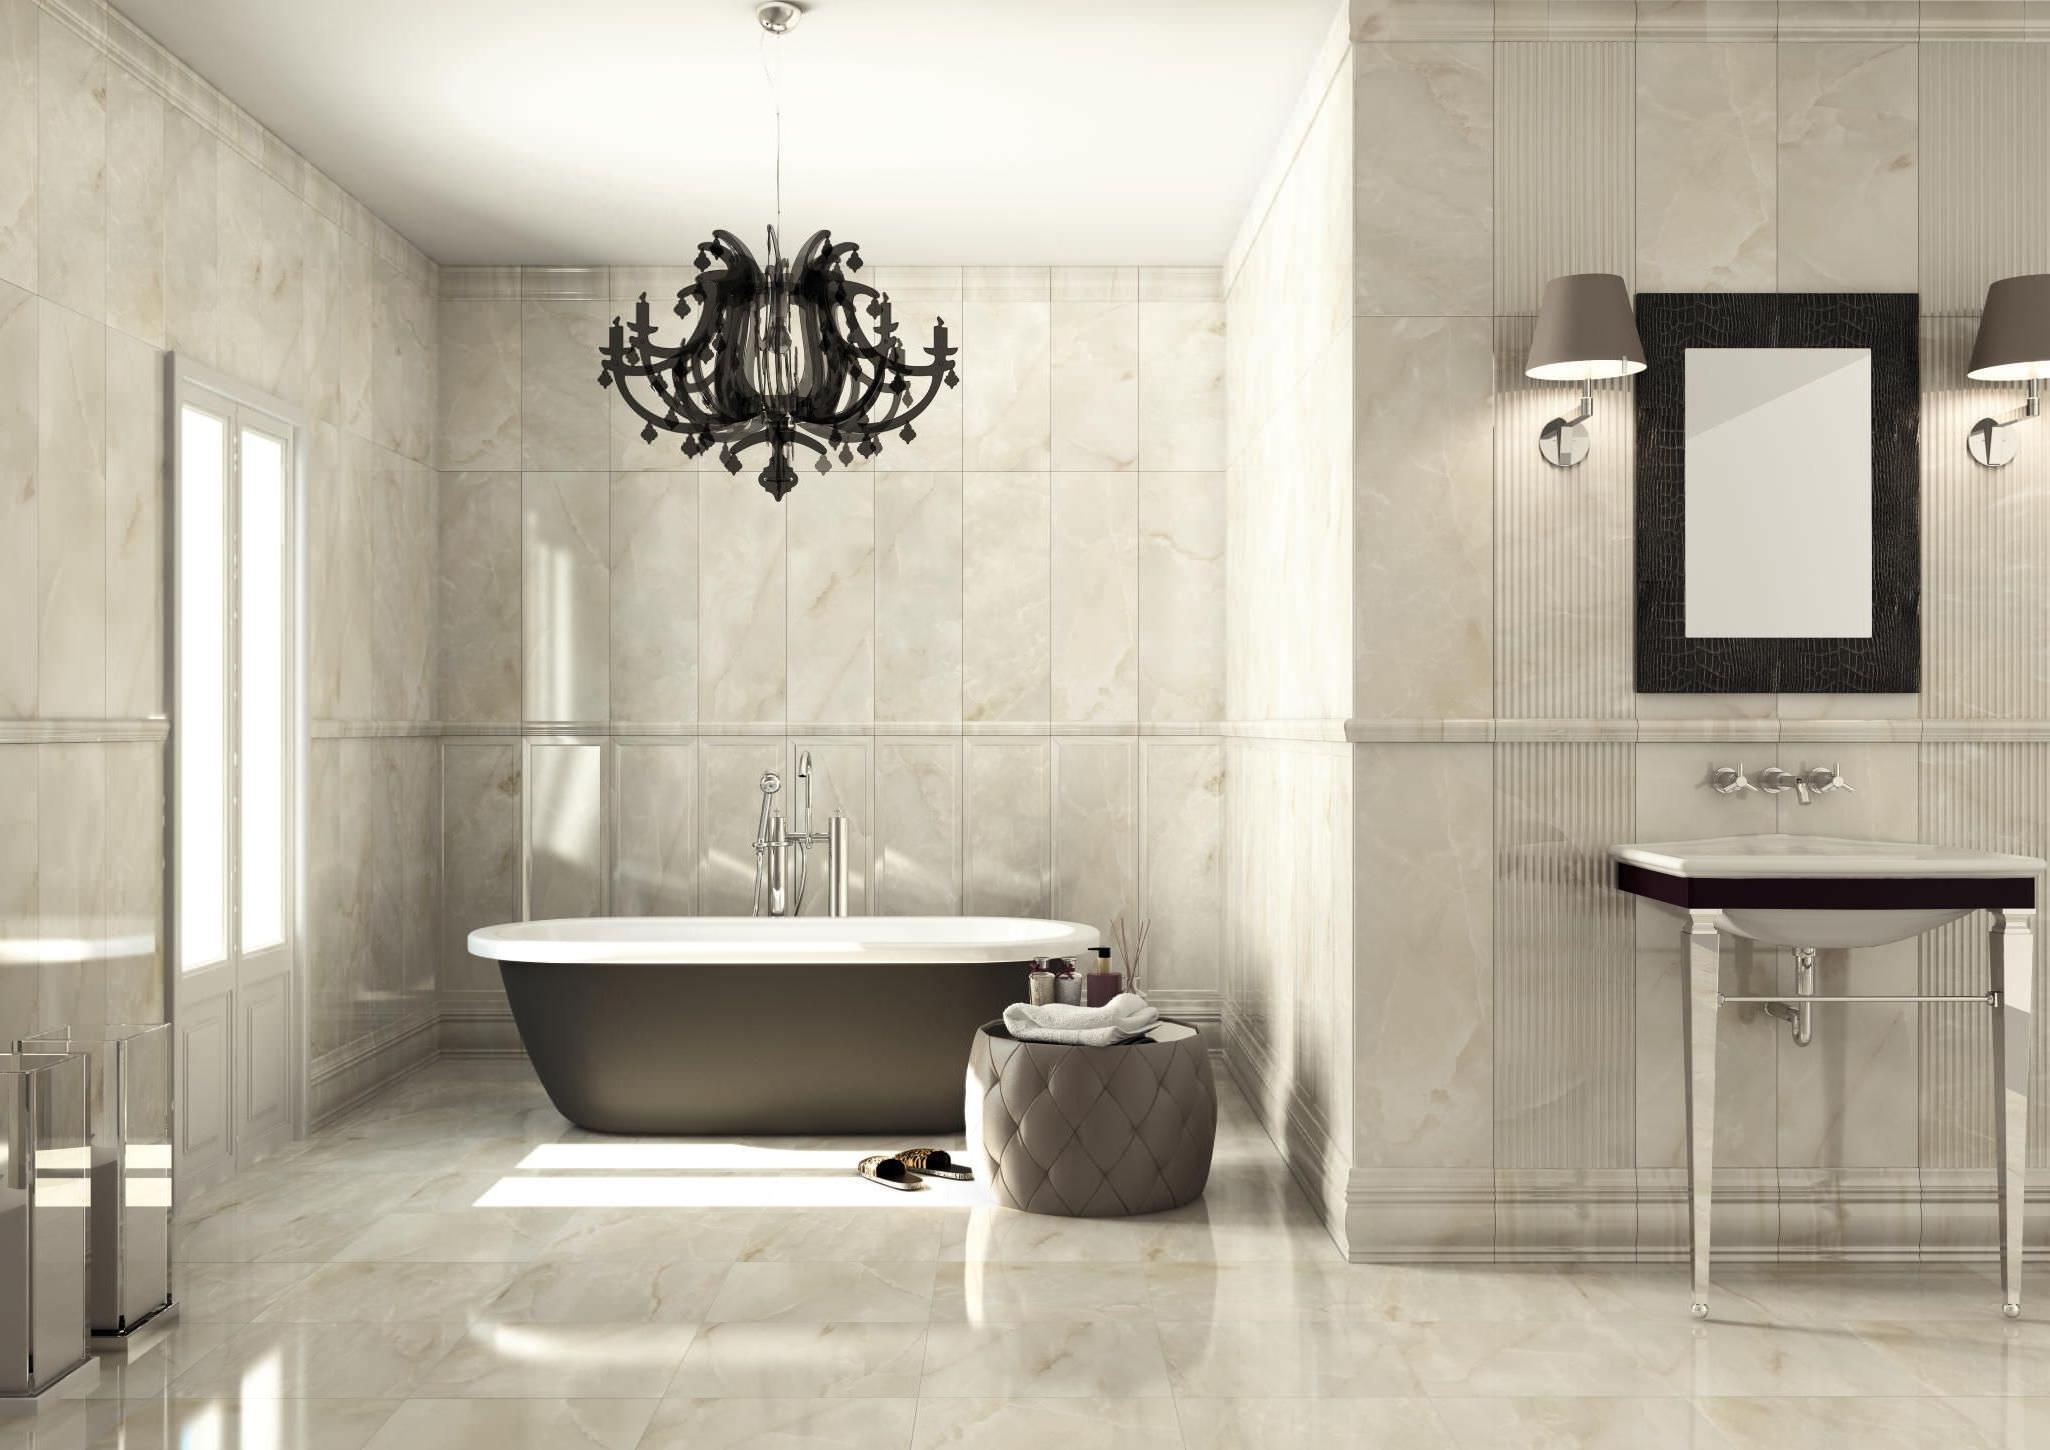 Uncategorized : Chandeliers For Bathroom Inside Inspiring Bathrooms Inside Most Popular Trendy Chandeliers (View 20 of 20)